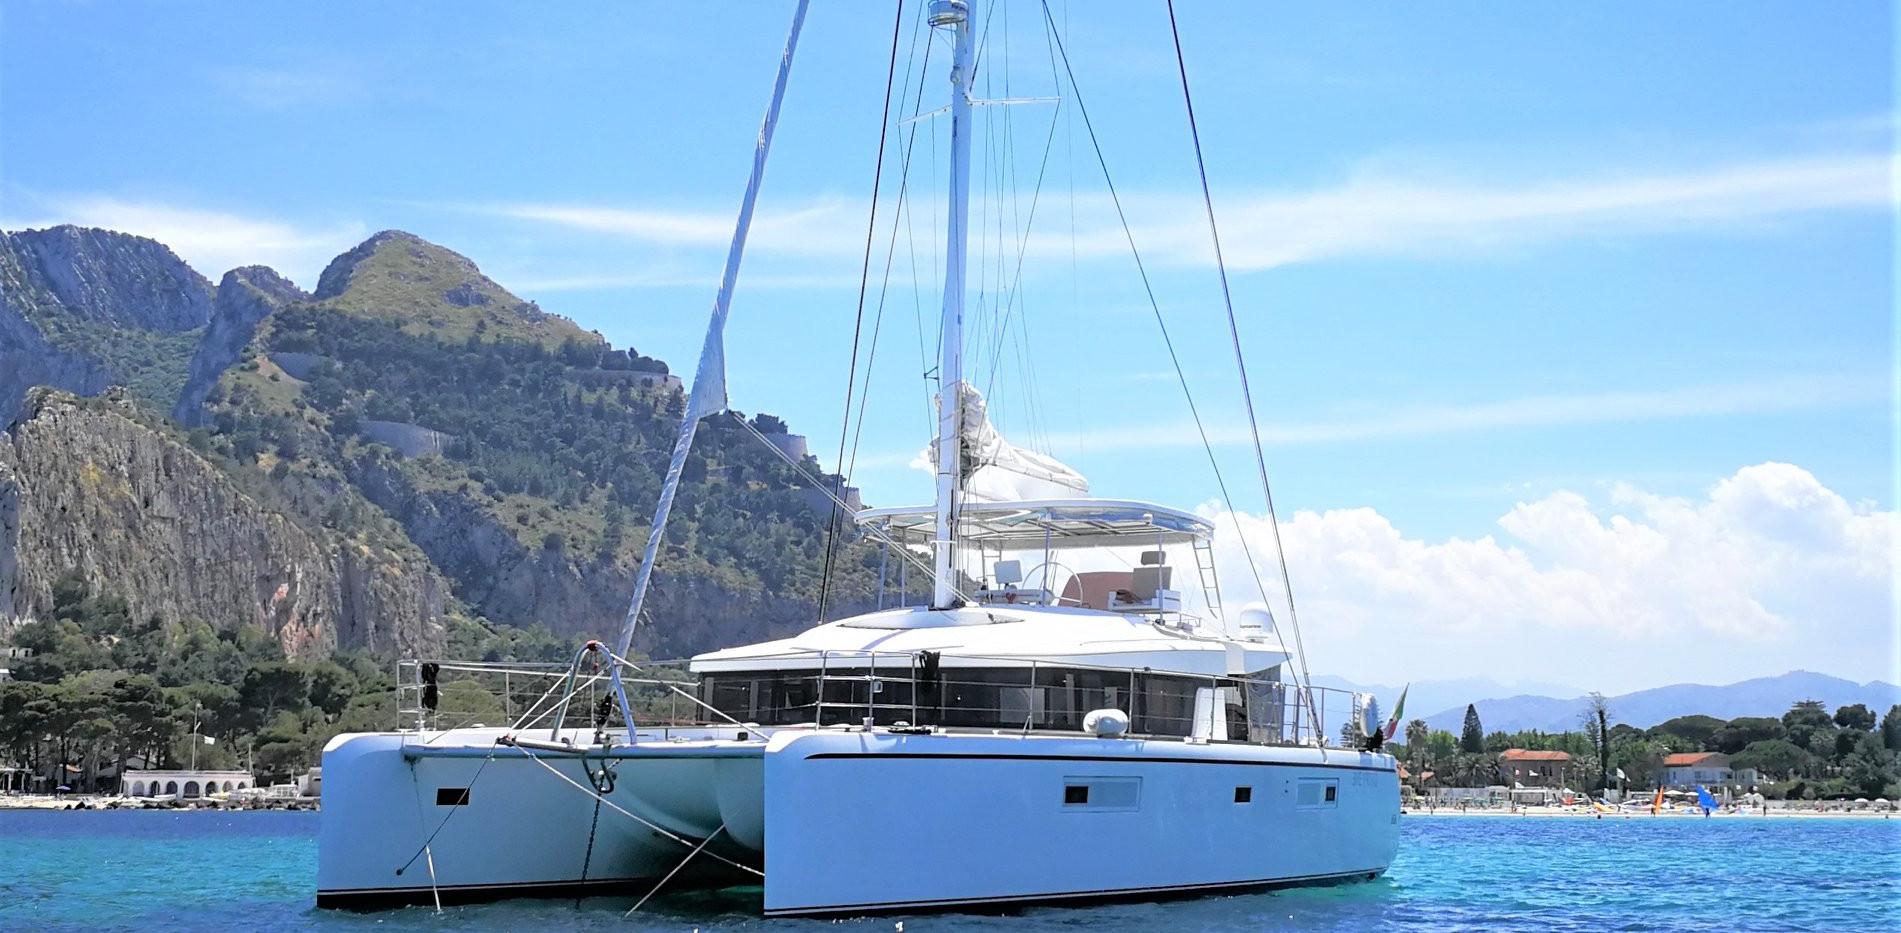 Crewed charter in sardinia